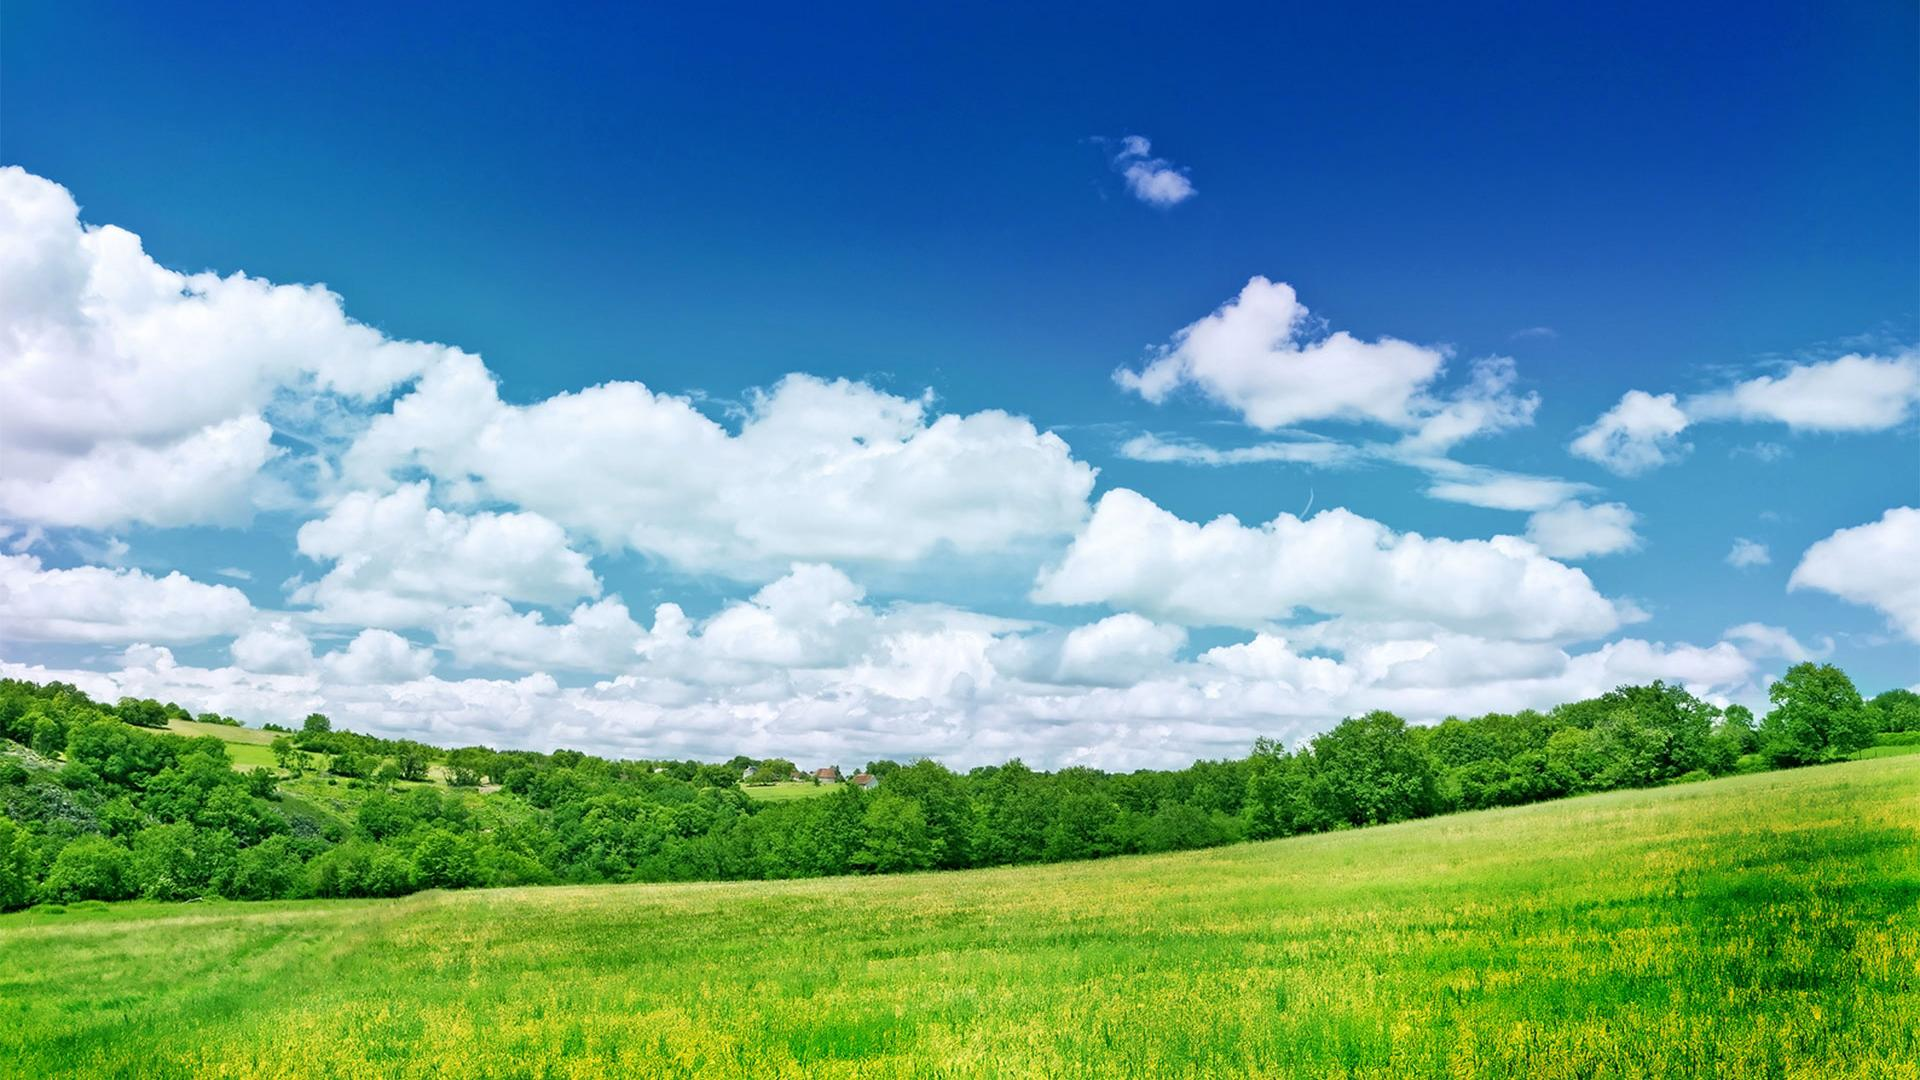 1920x1080 hd fresh summer grassland scenery backgrounds wide wallpapers:1280x800,1440x900,1680x1050 -